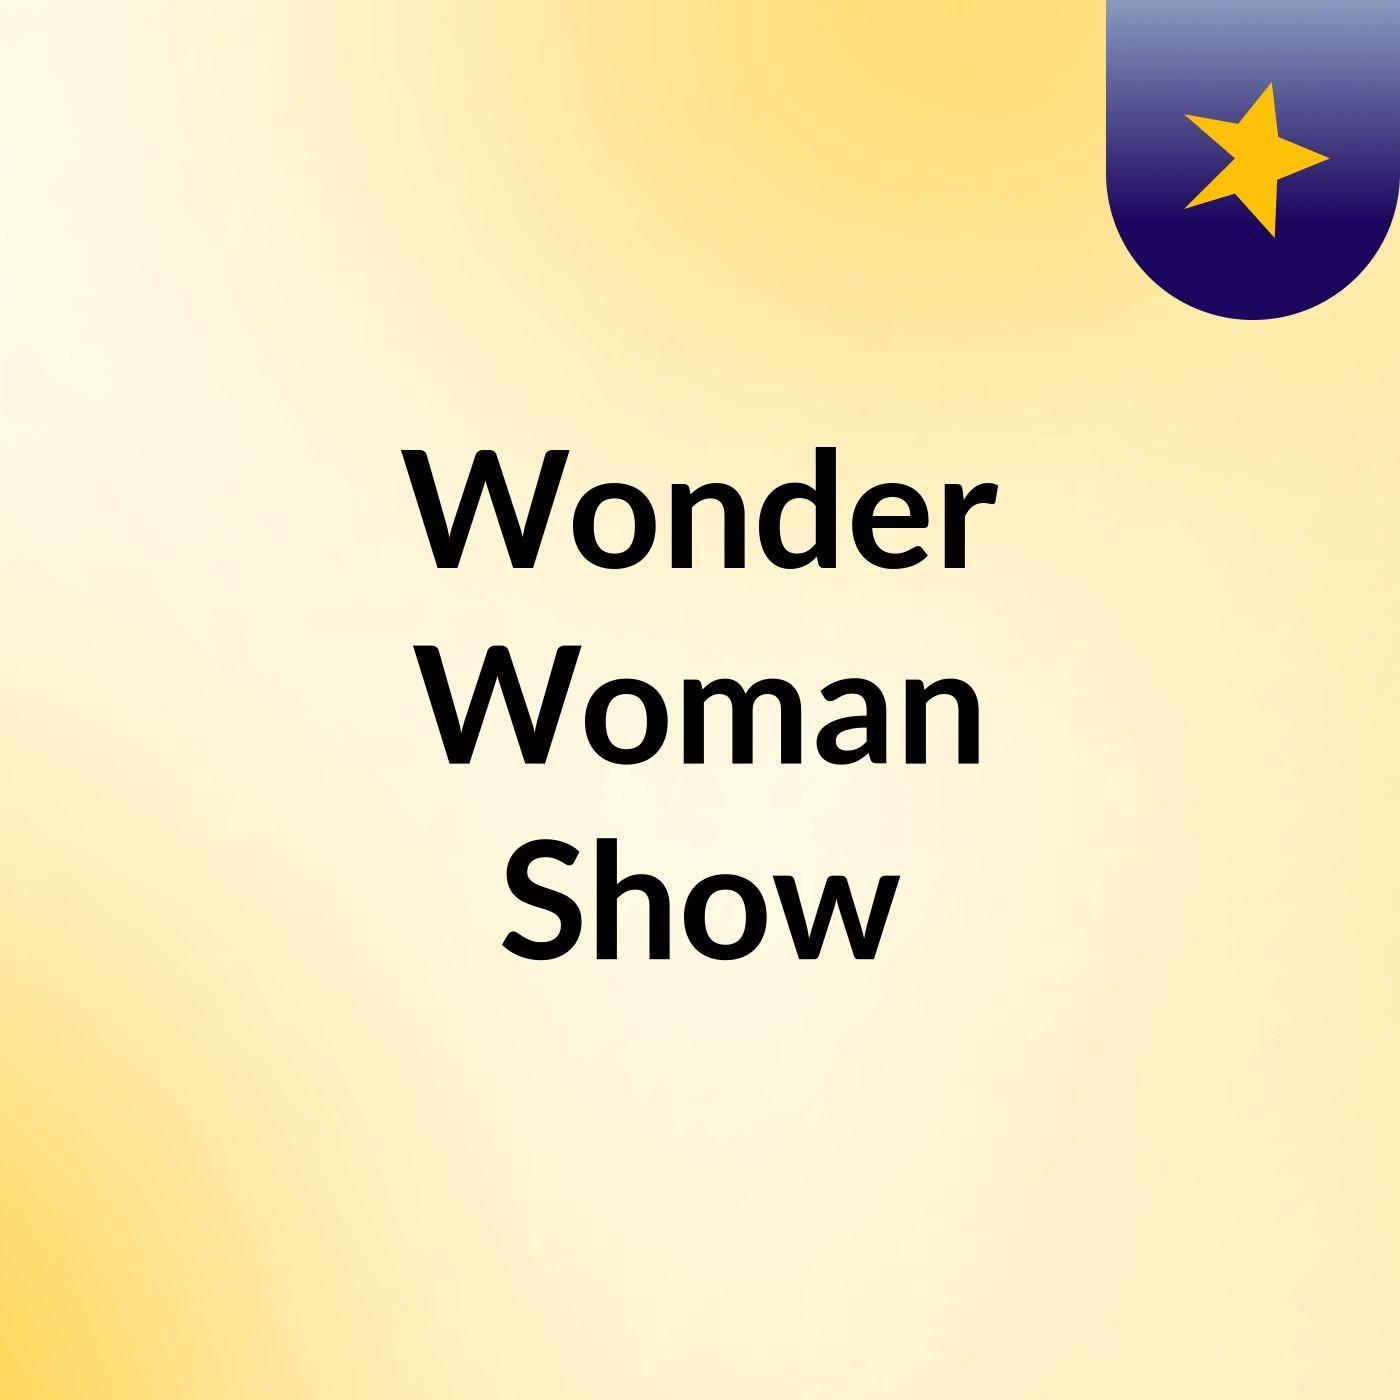 Wonder Woman Show